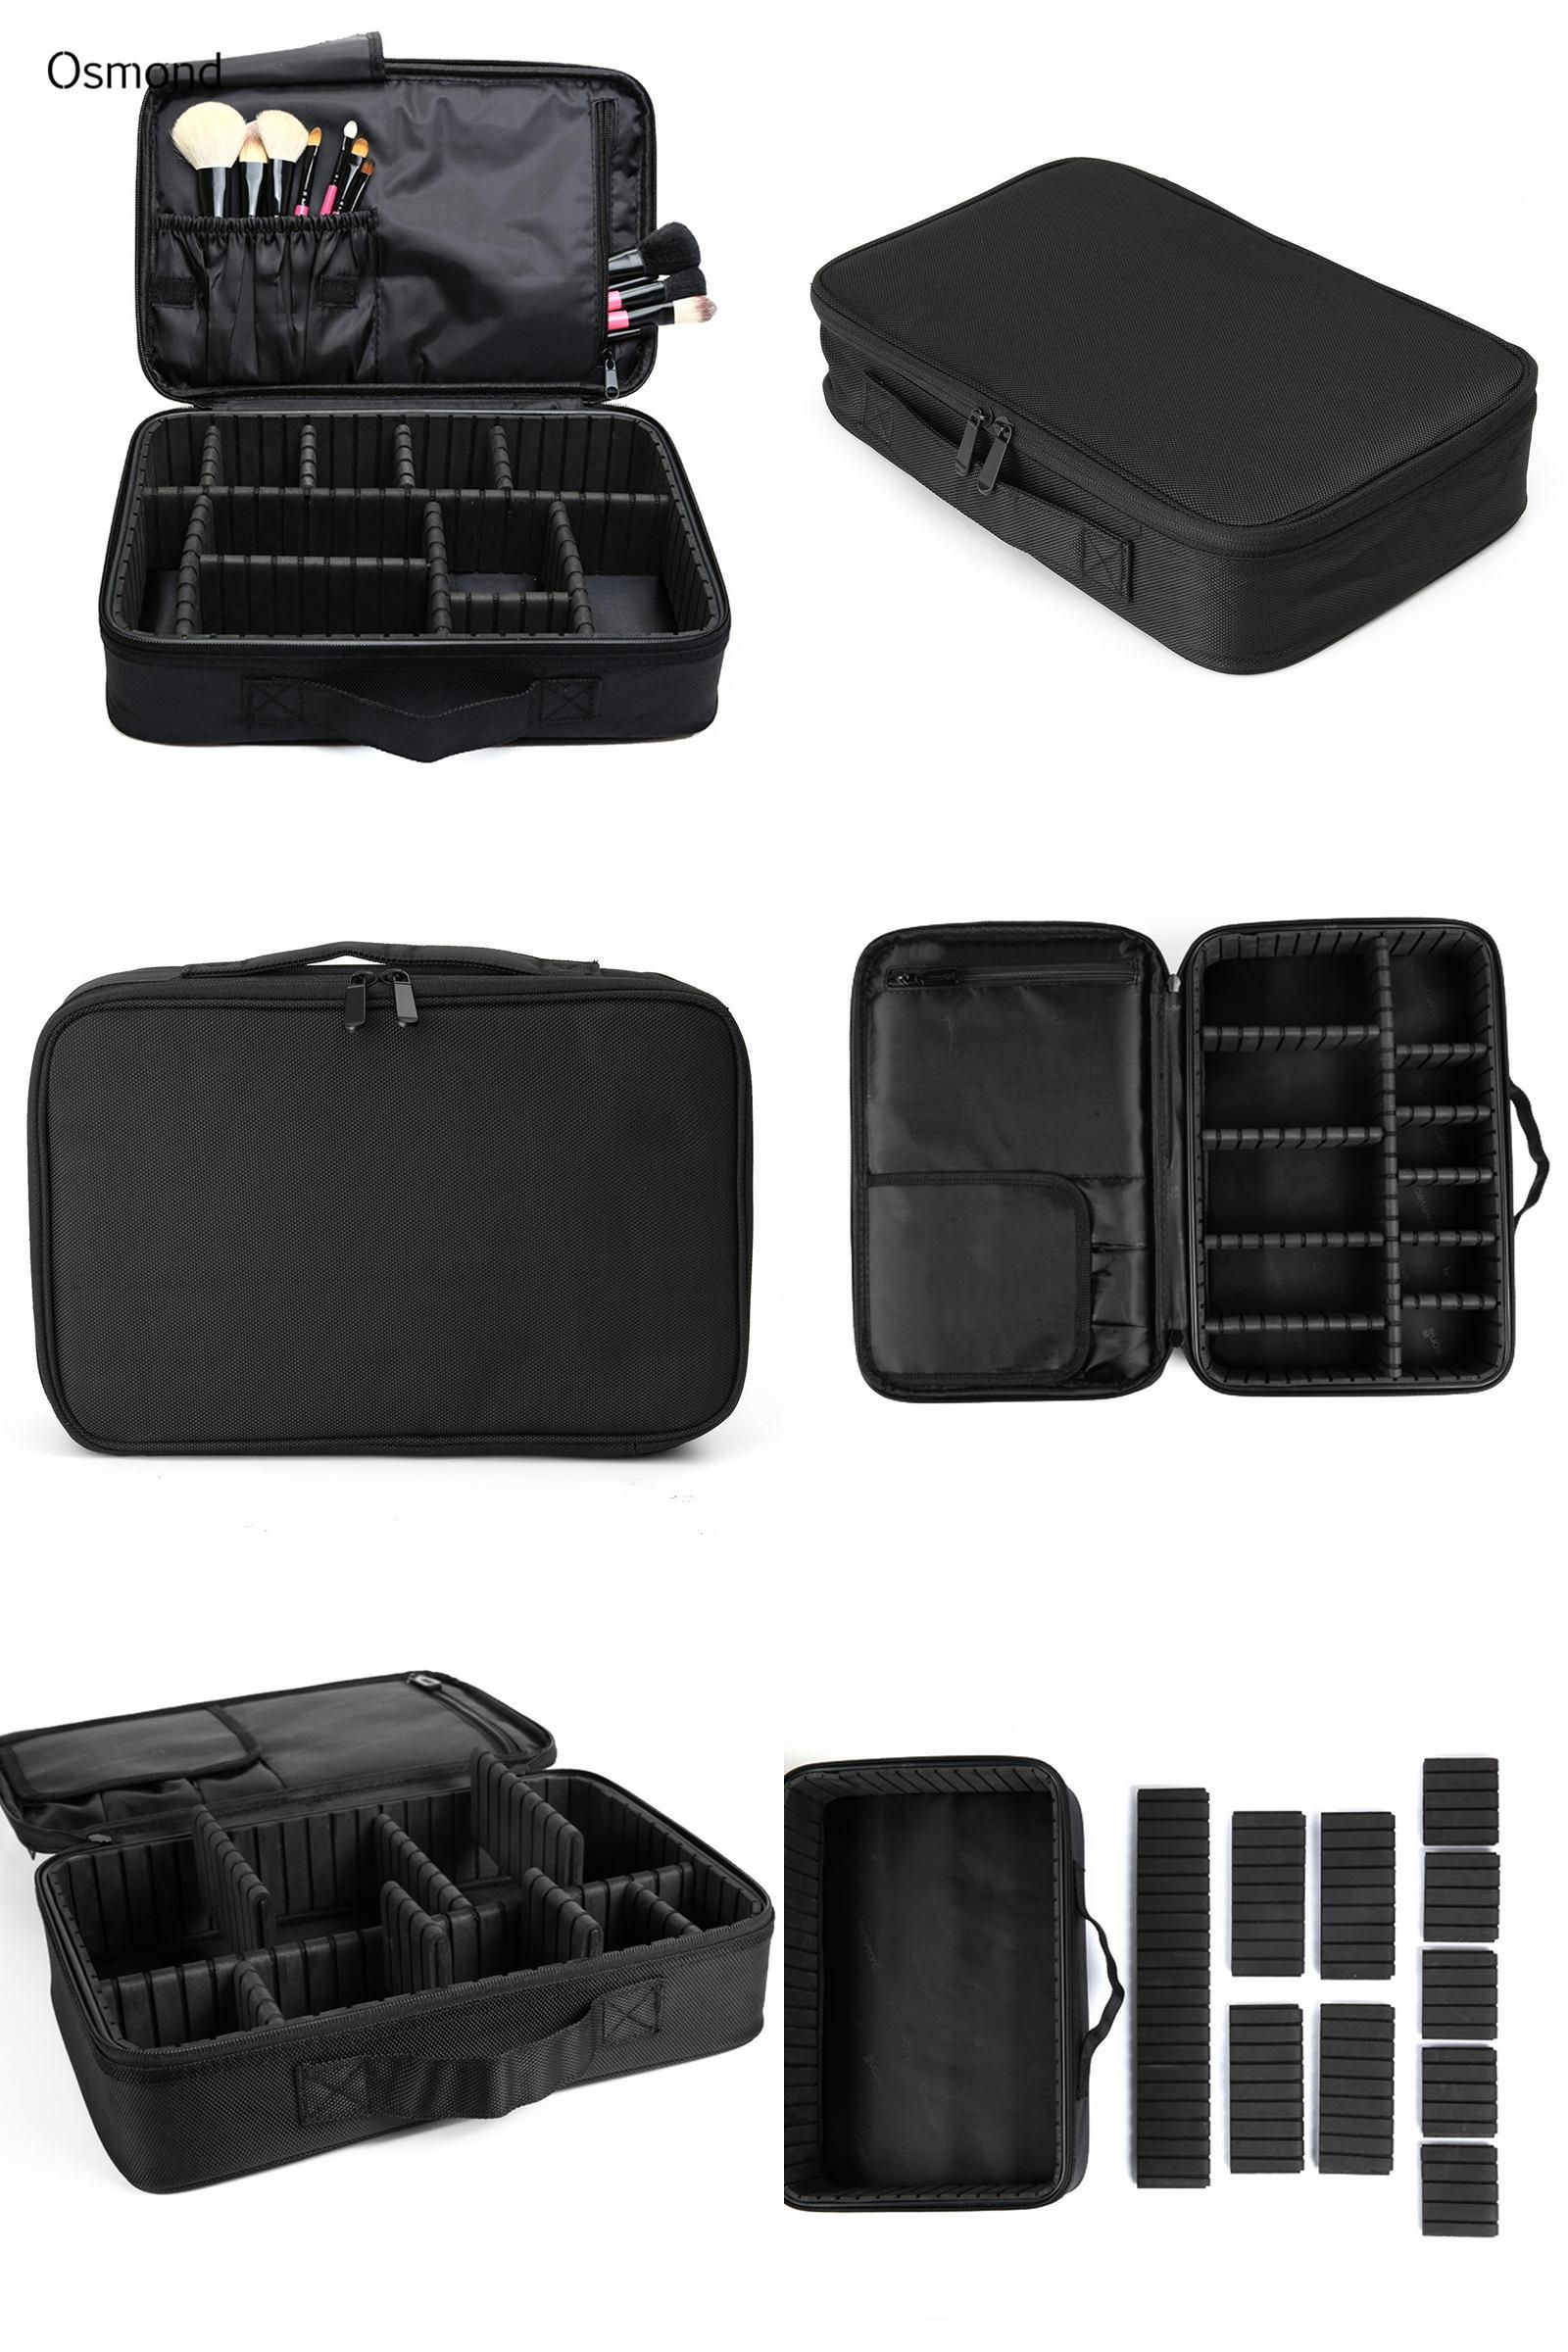 3bed59e7d7  Visit to Buy  Osmond Makeup Brush Bag Case Make Up Organizer Toiletry Bag  Storage